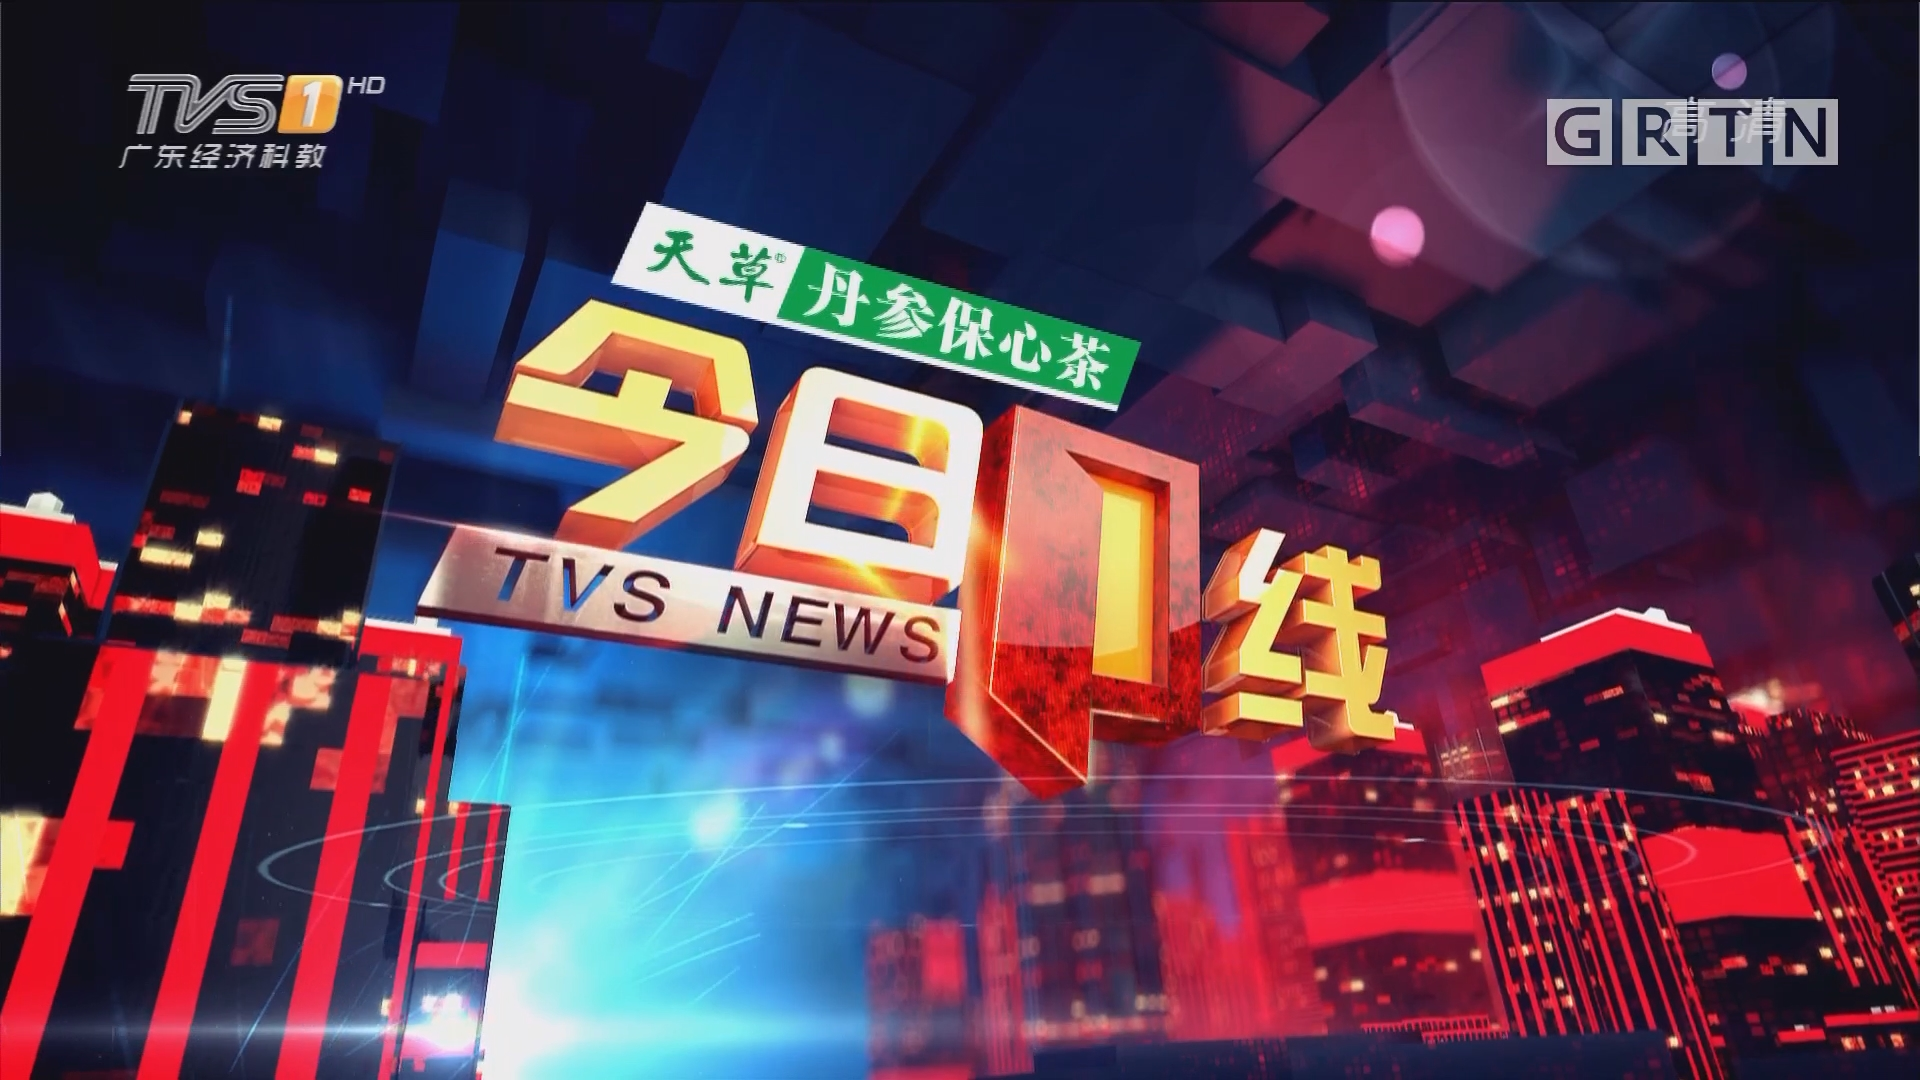 [HD][2018-01-18]今日一线:天气:广州今年首次遭PM2.5重度污染